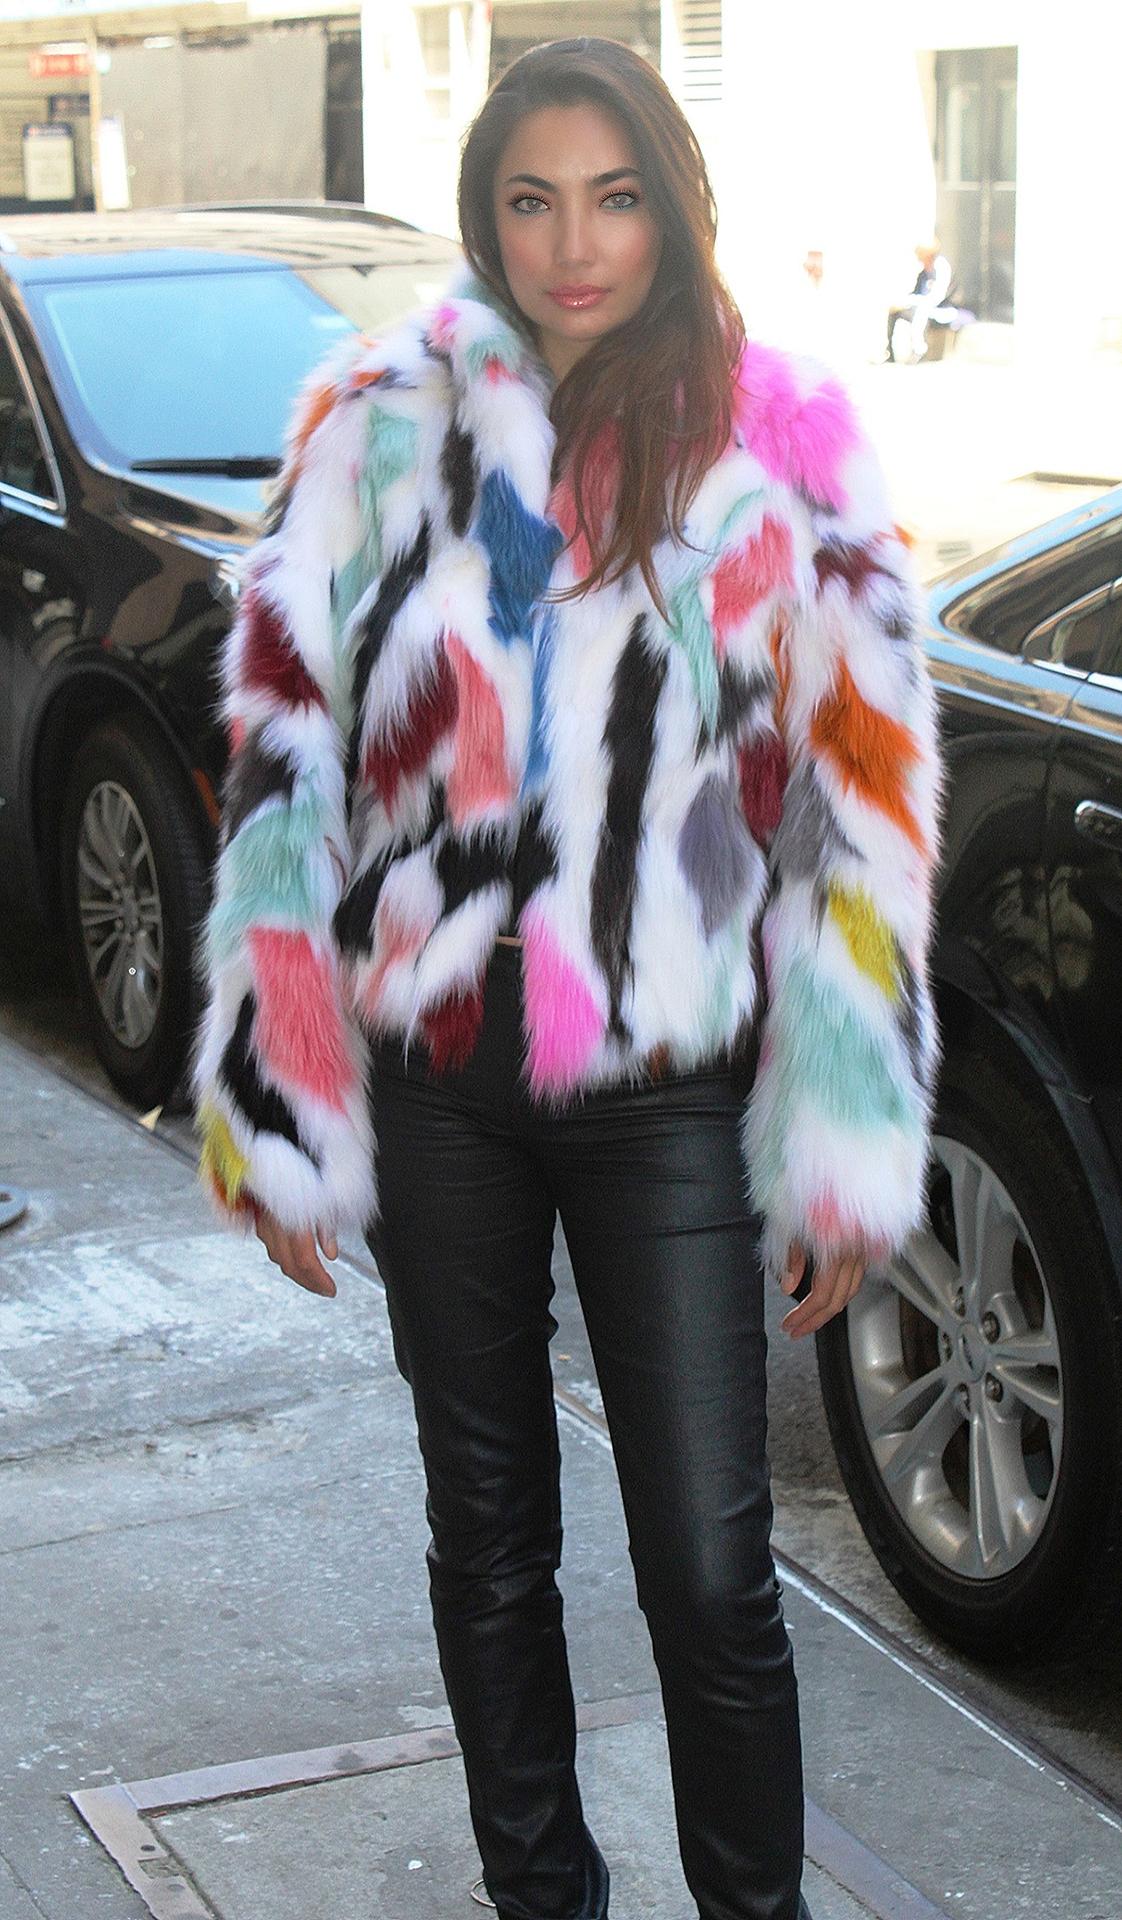 Share Multi Colored Fox Jacket